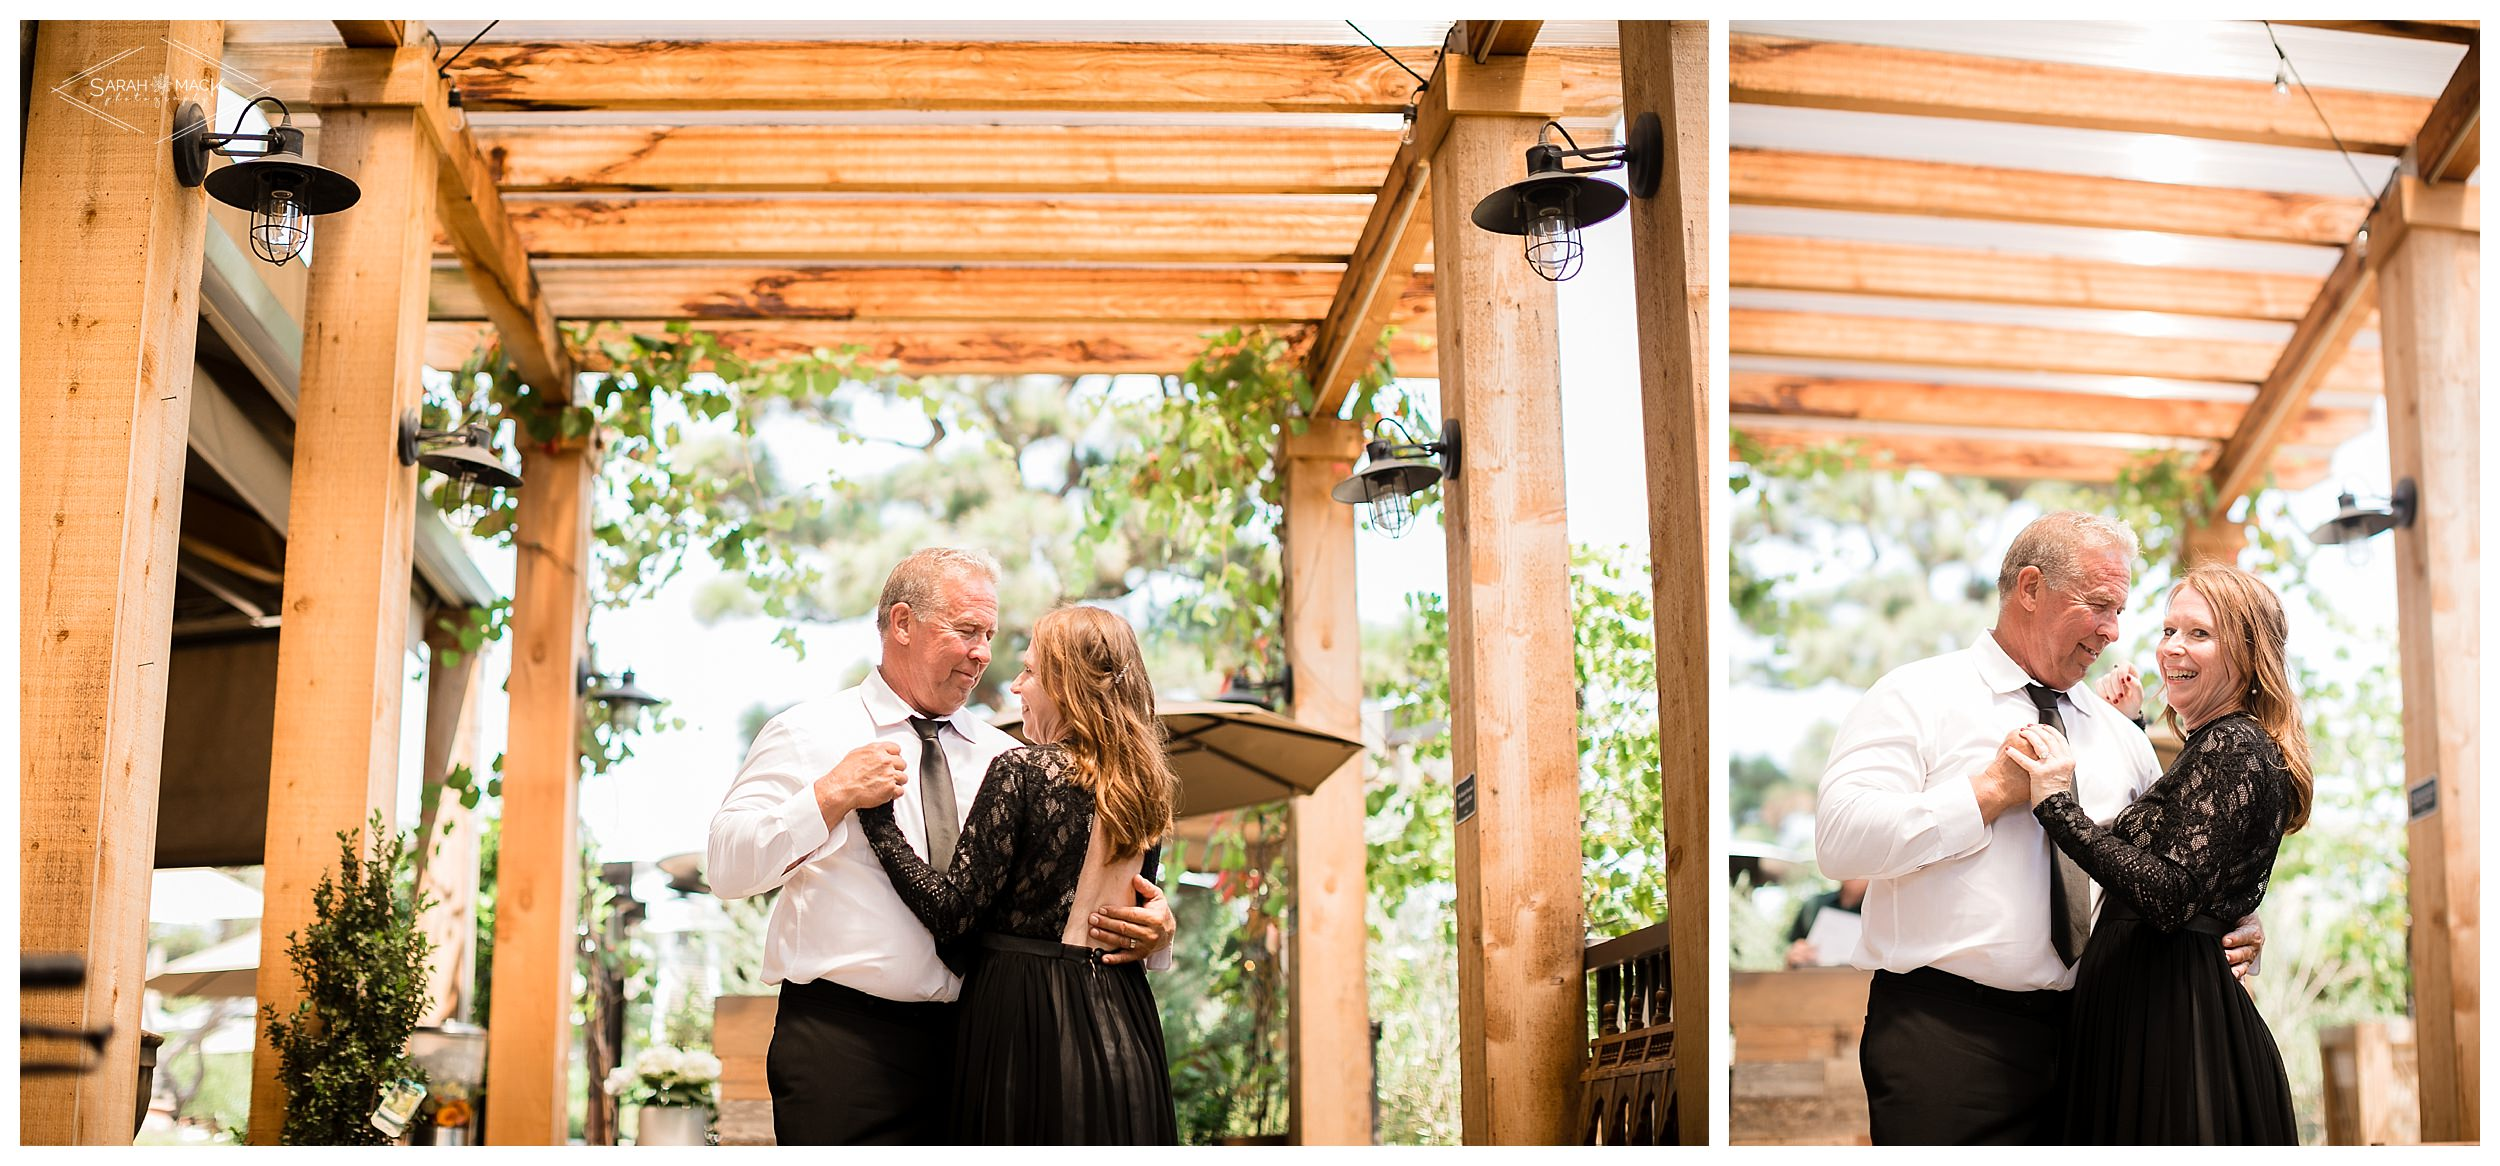 LM-Newport-Beach-Pier-Intimate-Wedding-Photography 301.jpg